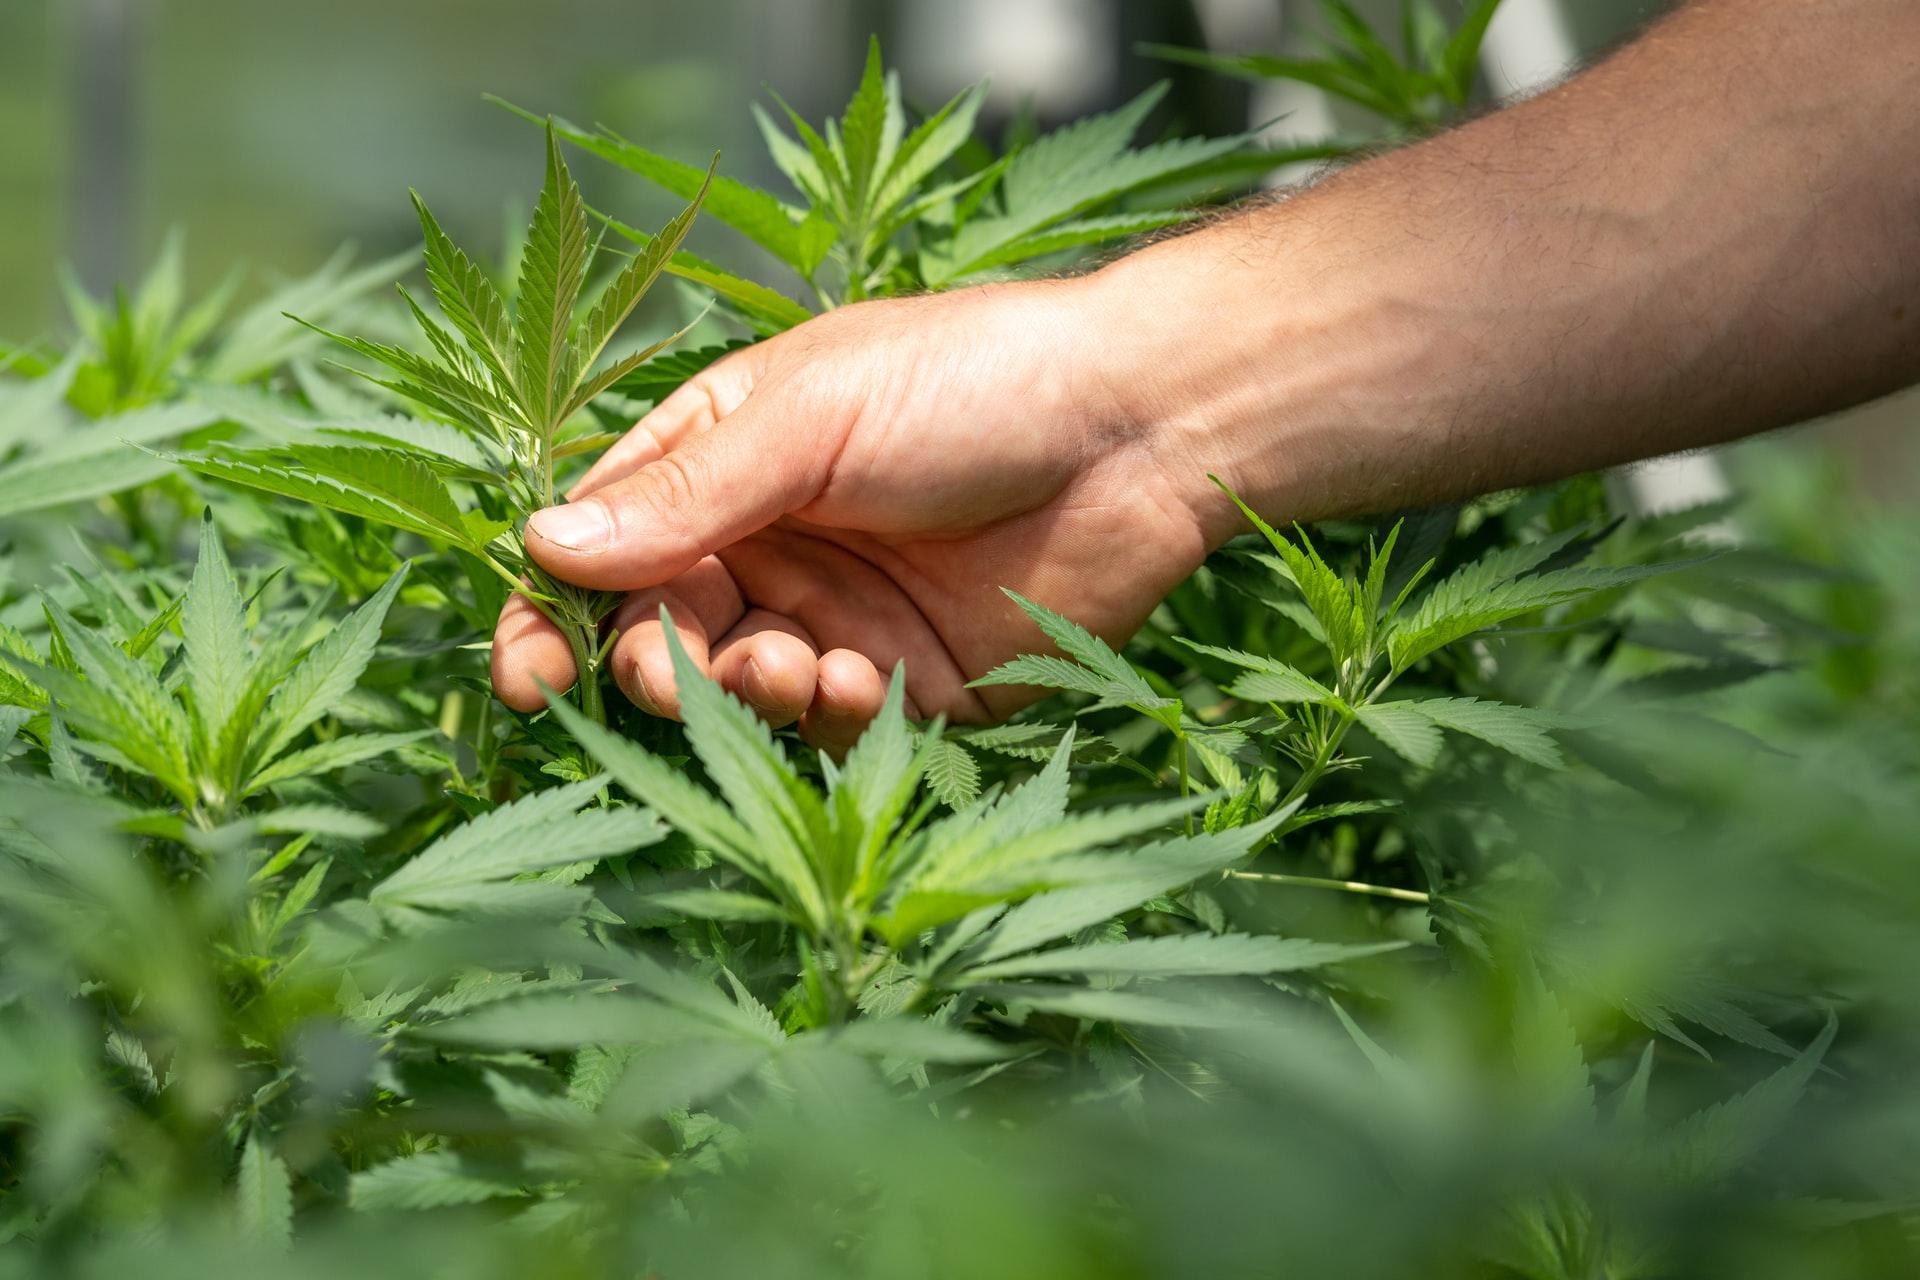 plantes-image-crystalweed-cannabis-unsplash